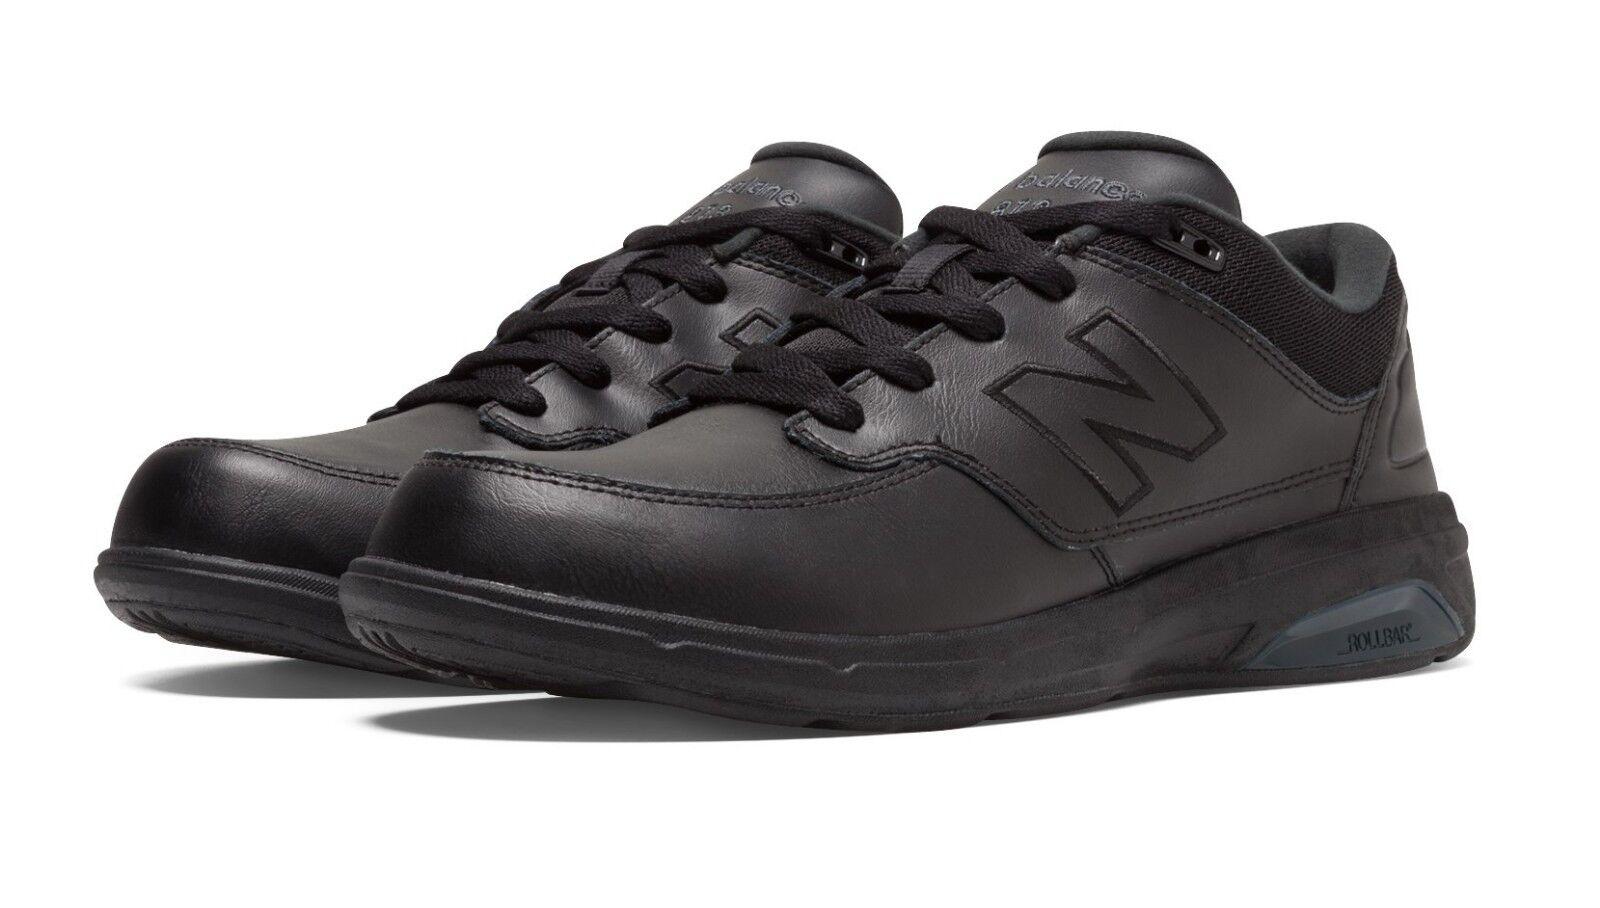 New Balance MW813BK Men's 813 Black Leather Motion Control Health Walking shoes